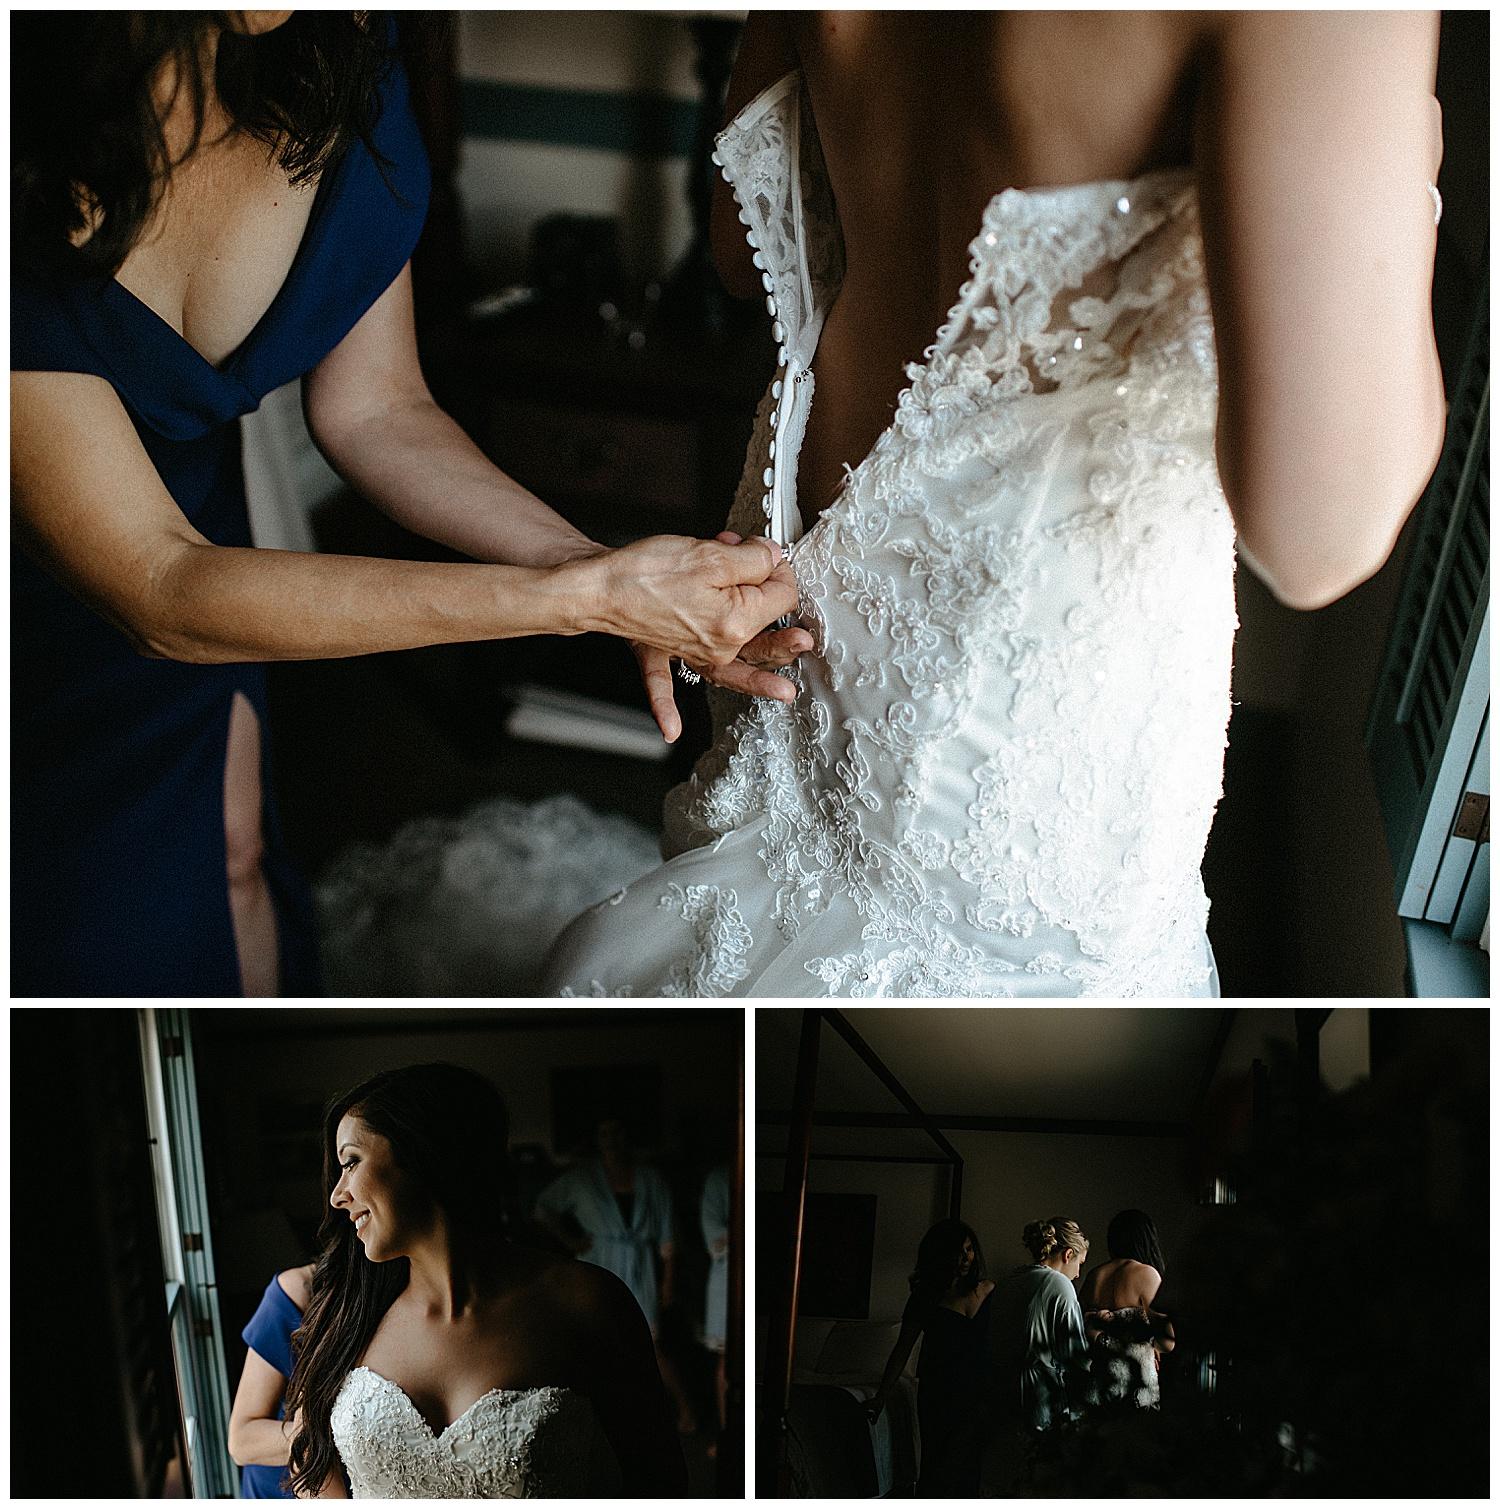 NEPA-Bloomsburg-Wedding-Photographer-at-The-Barn-at-Boones-Dam-Bloomsburg-PA_0070.jpg